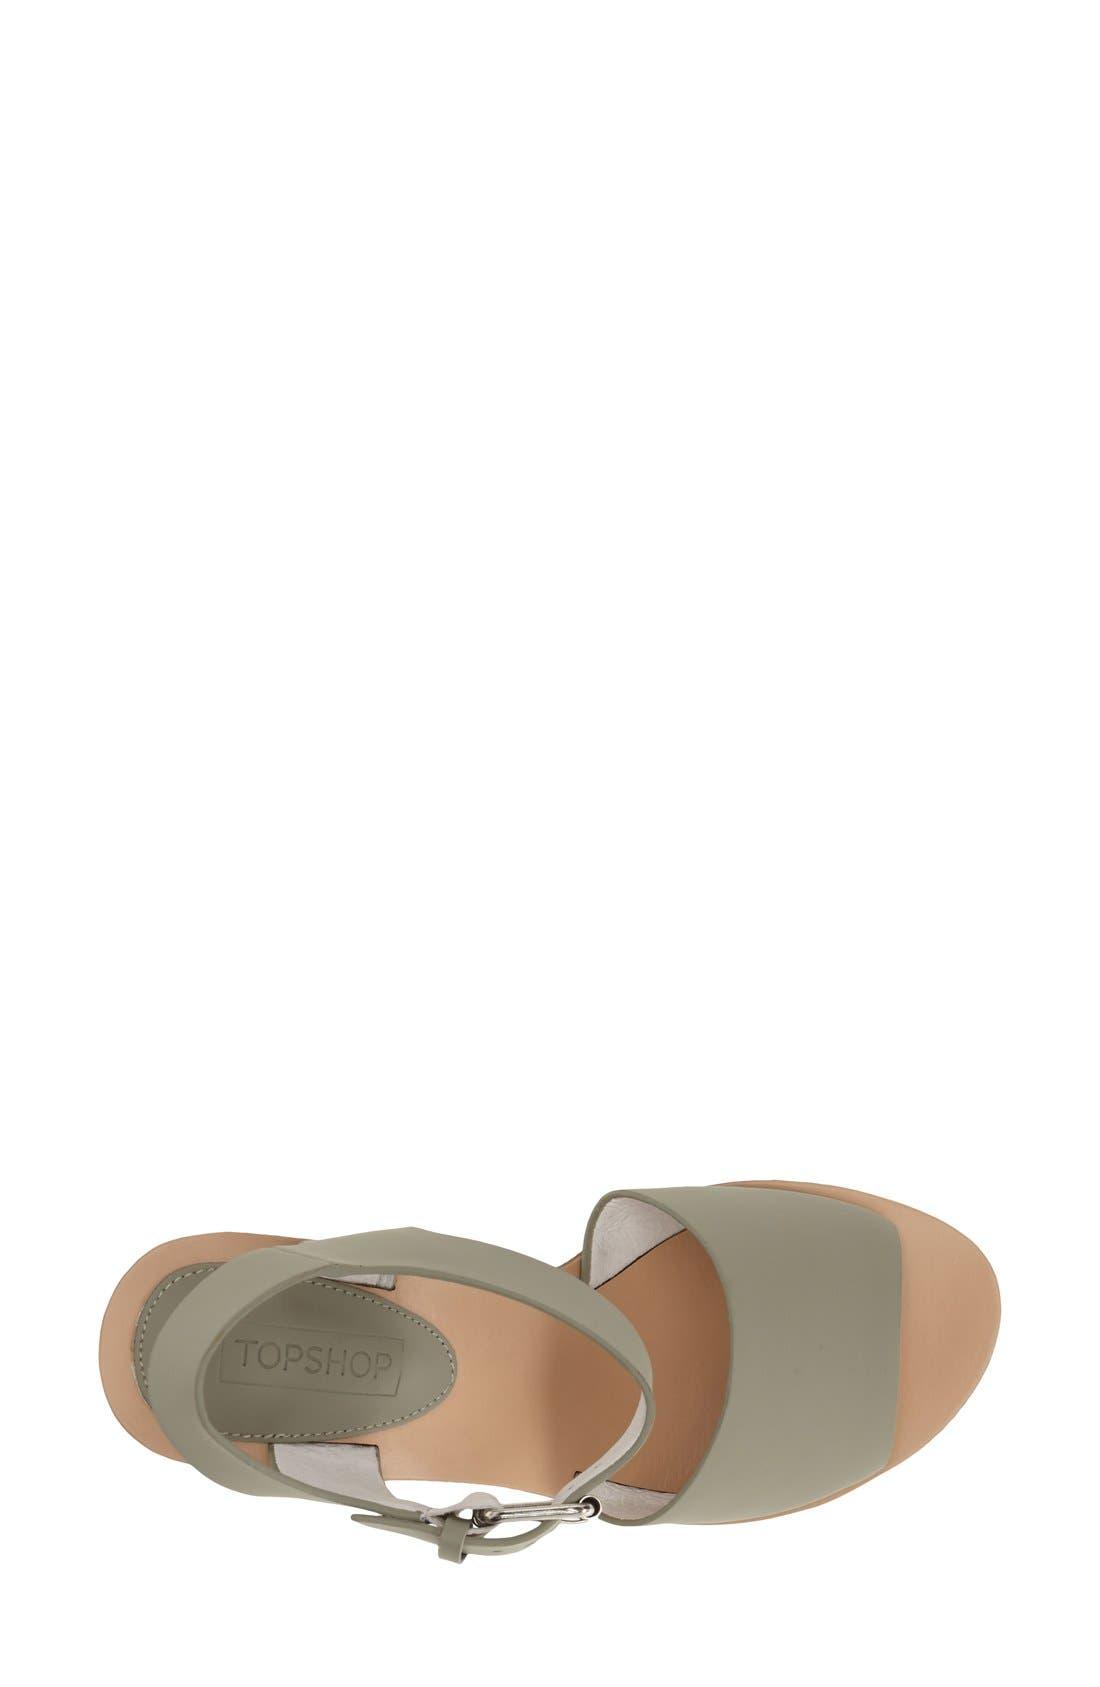 Alternate Image 3  - Topshop Platform Wedge Sandal (Women)